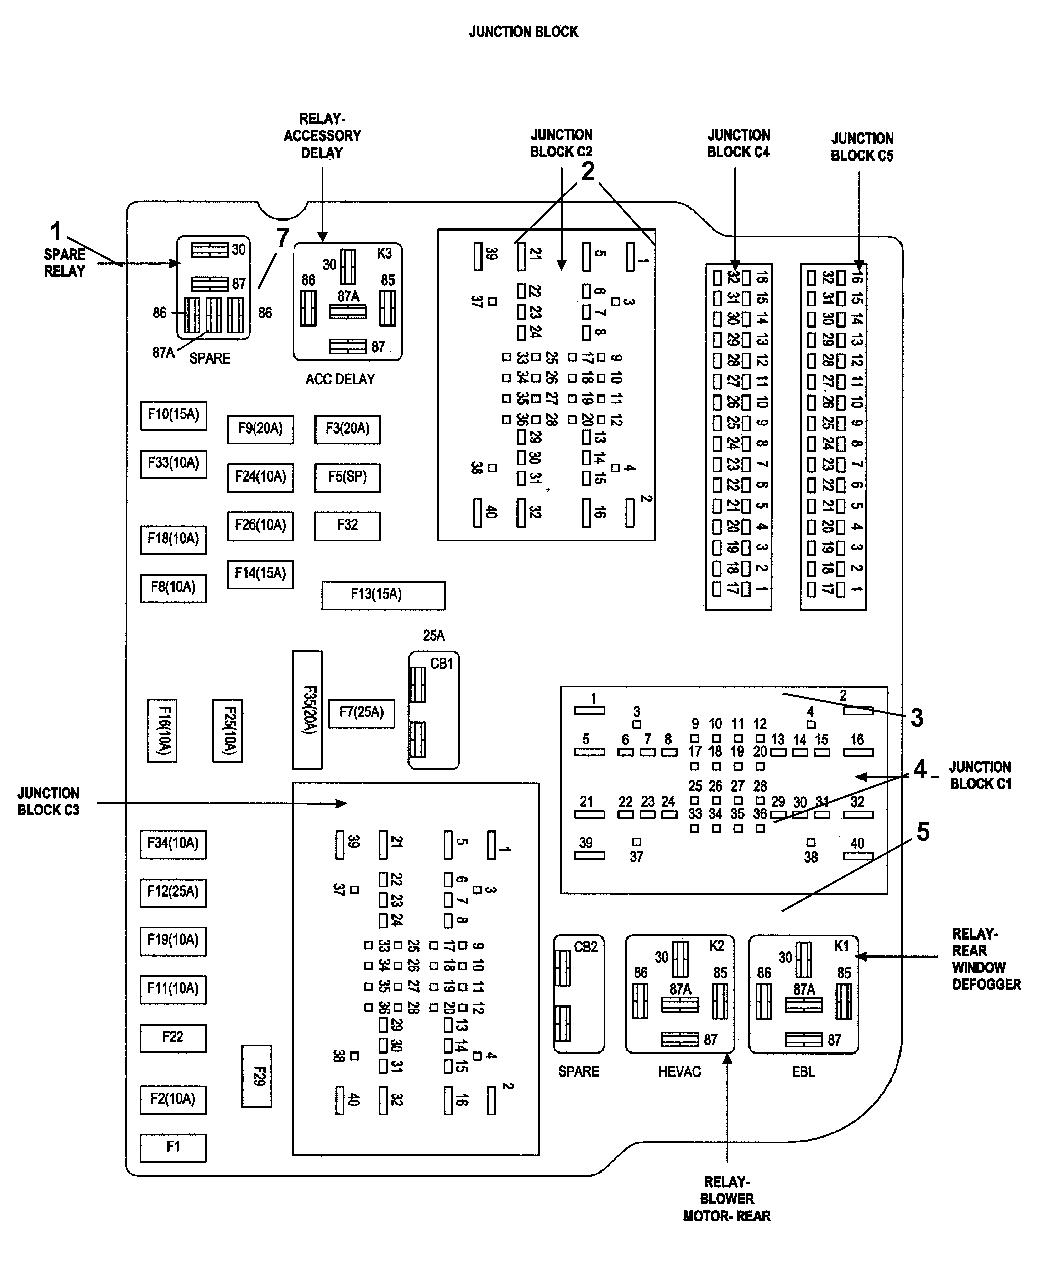 2008 chrysler aspen junction block fuses & relays 2008 chrysler aspen radio wiring diagram 2008 Chrysler Aspen Fuse Diagram #2